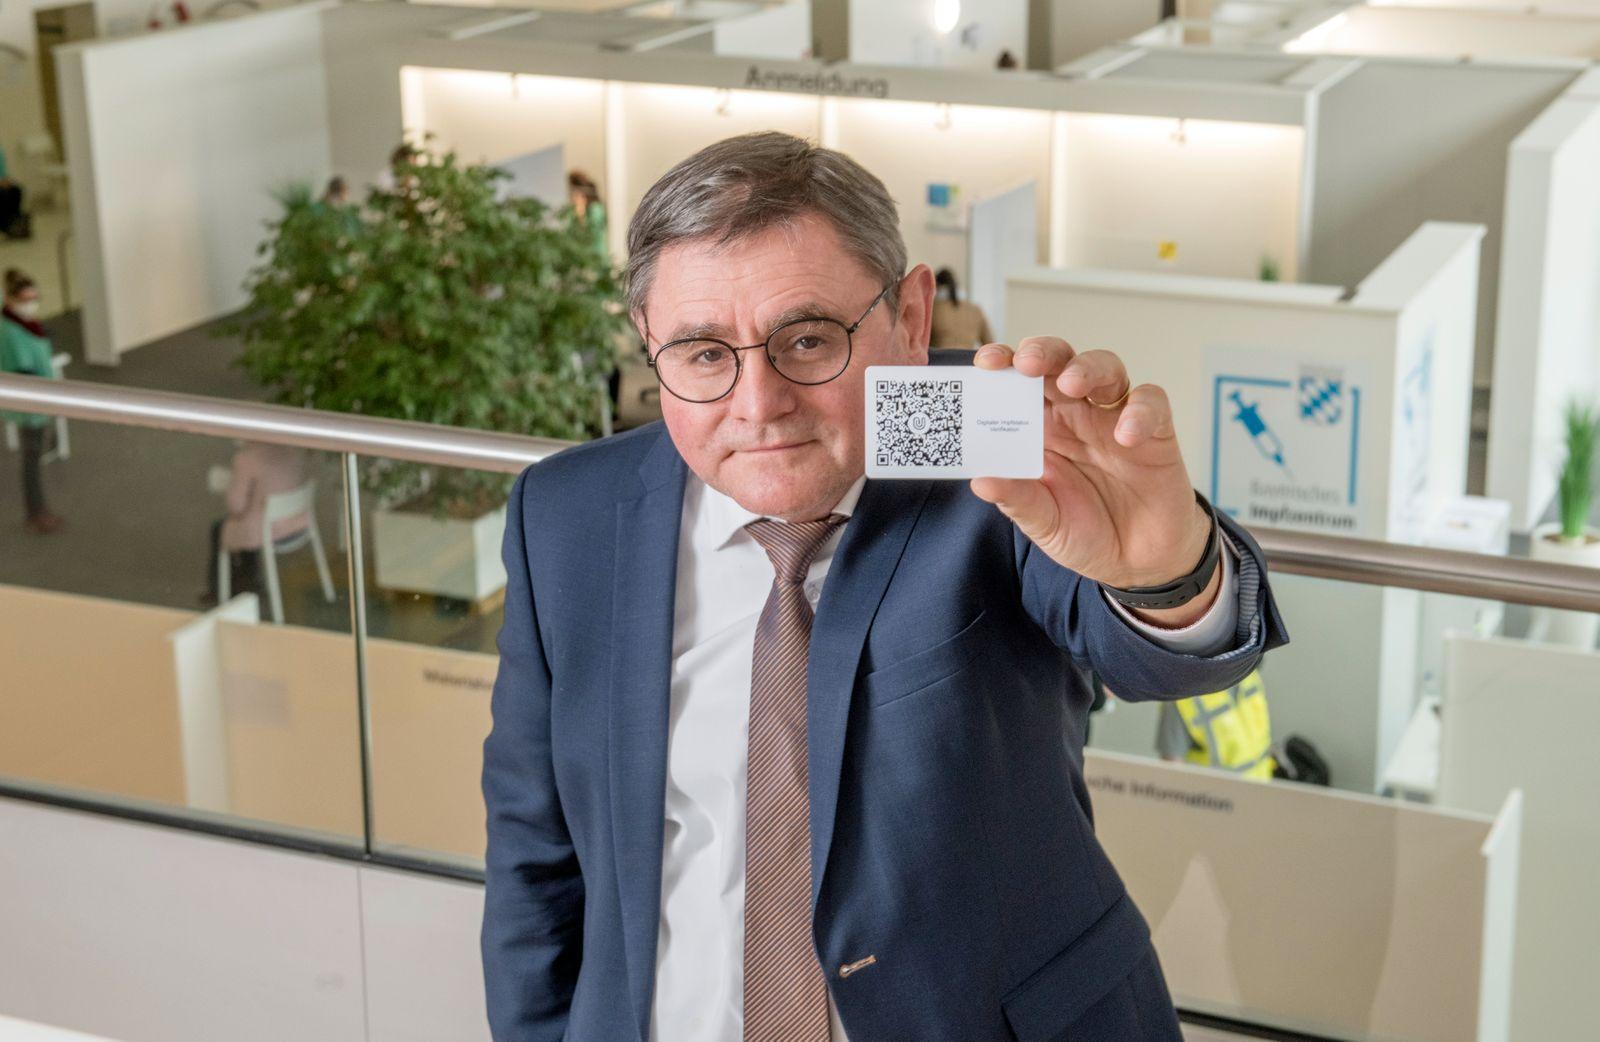 Landrat Erwin Schneider, Thema:digitaler Impfausweis, Altoetting, Maerz 2021